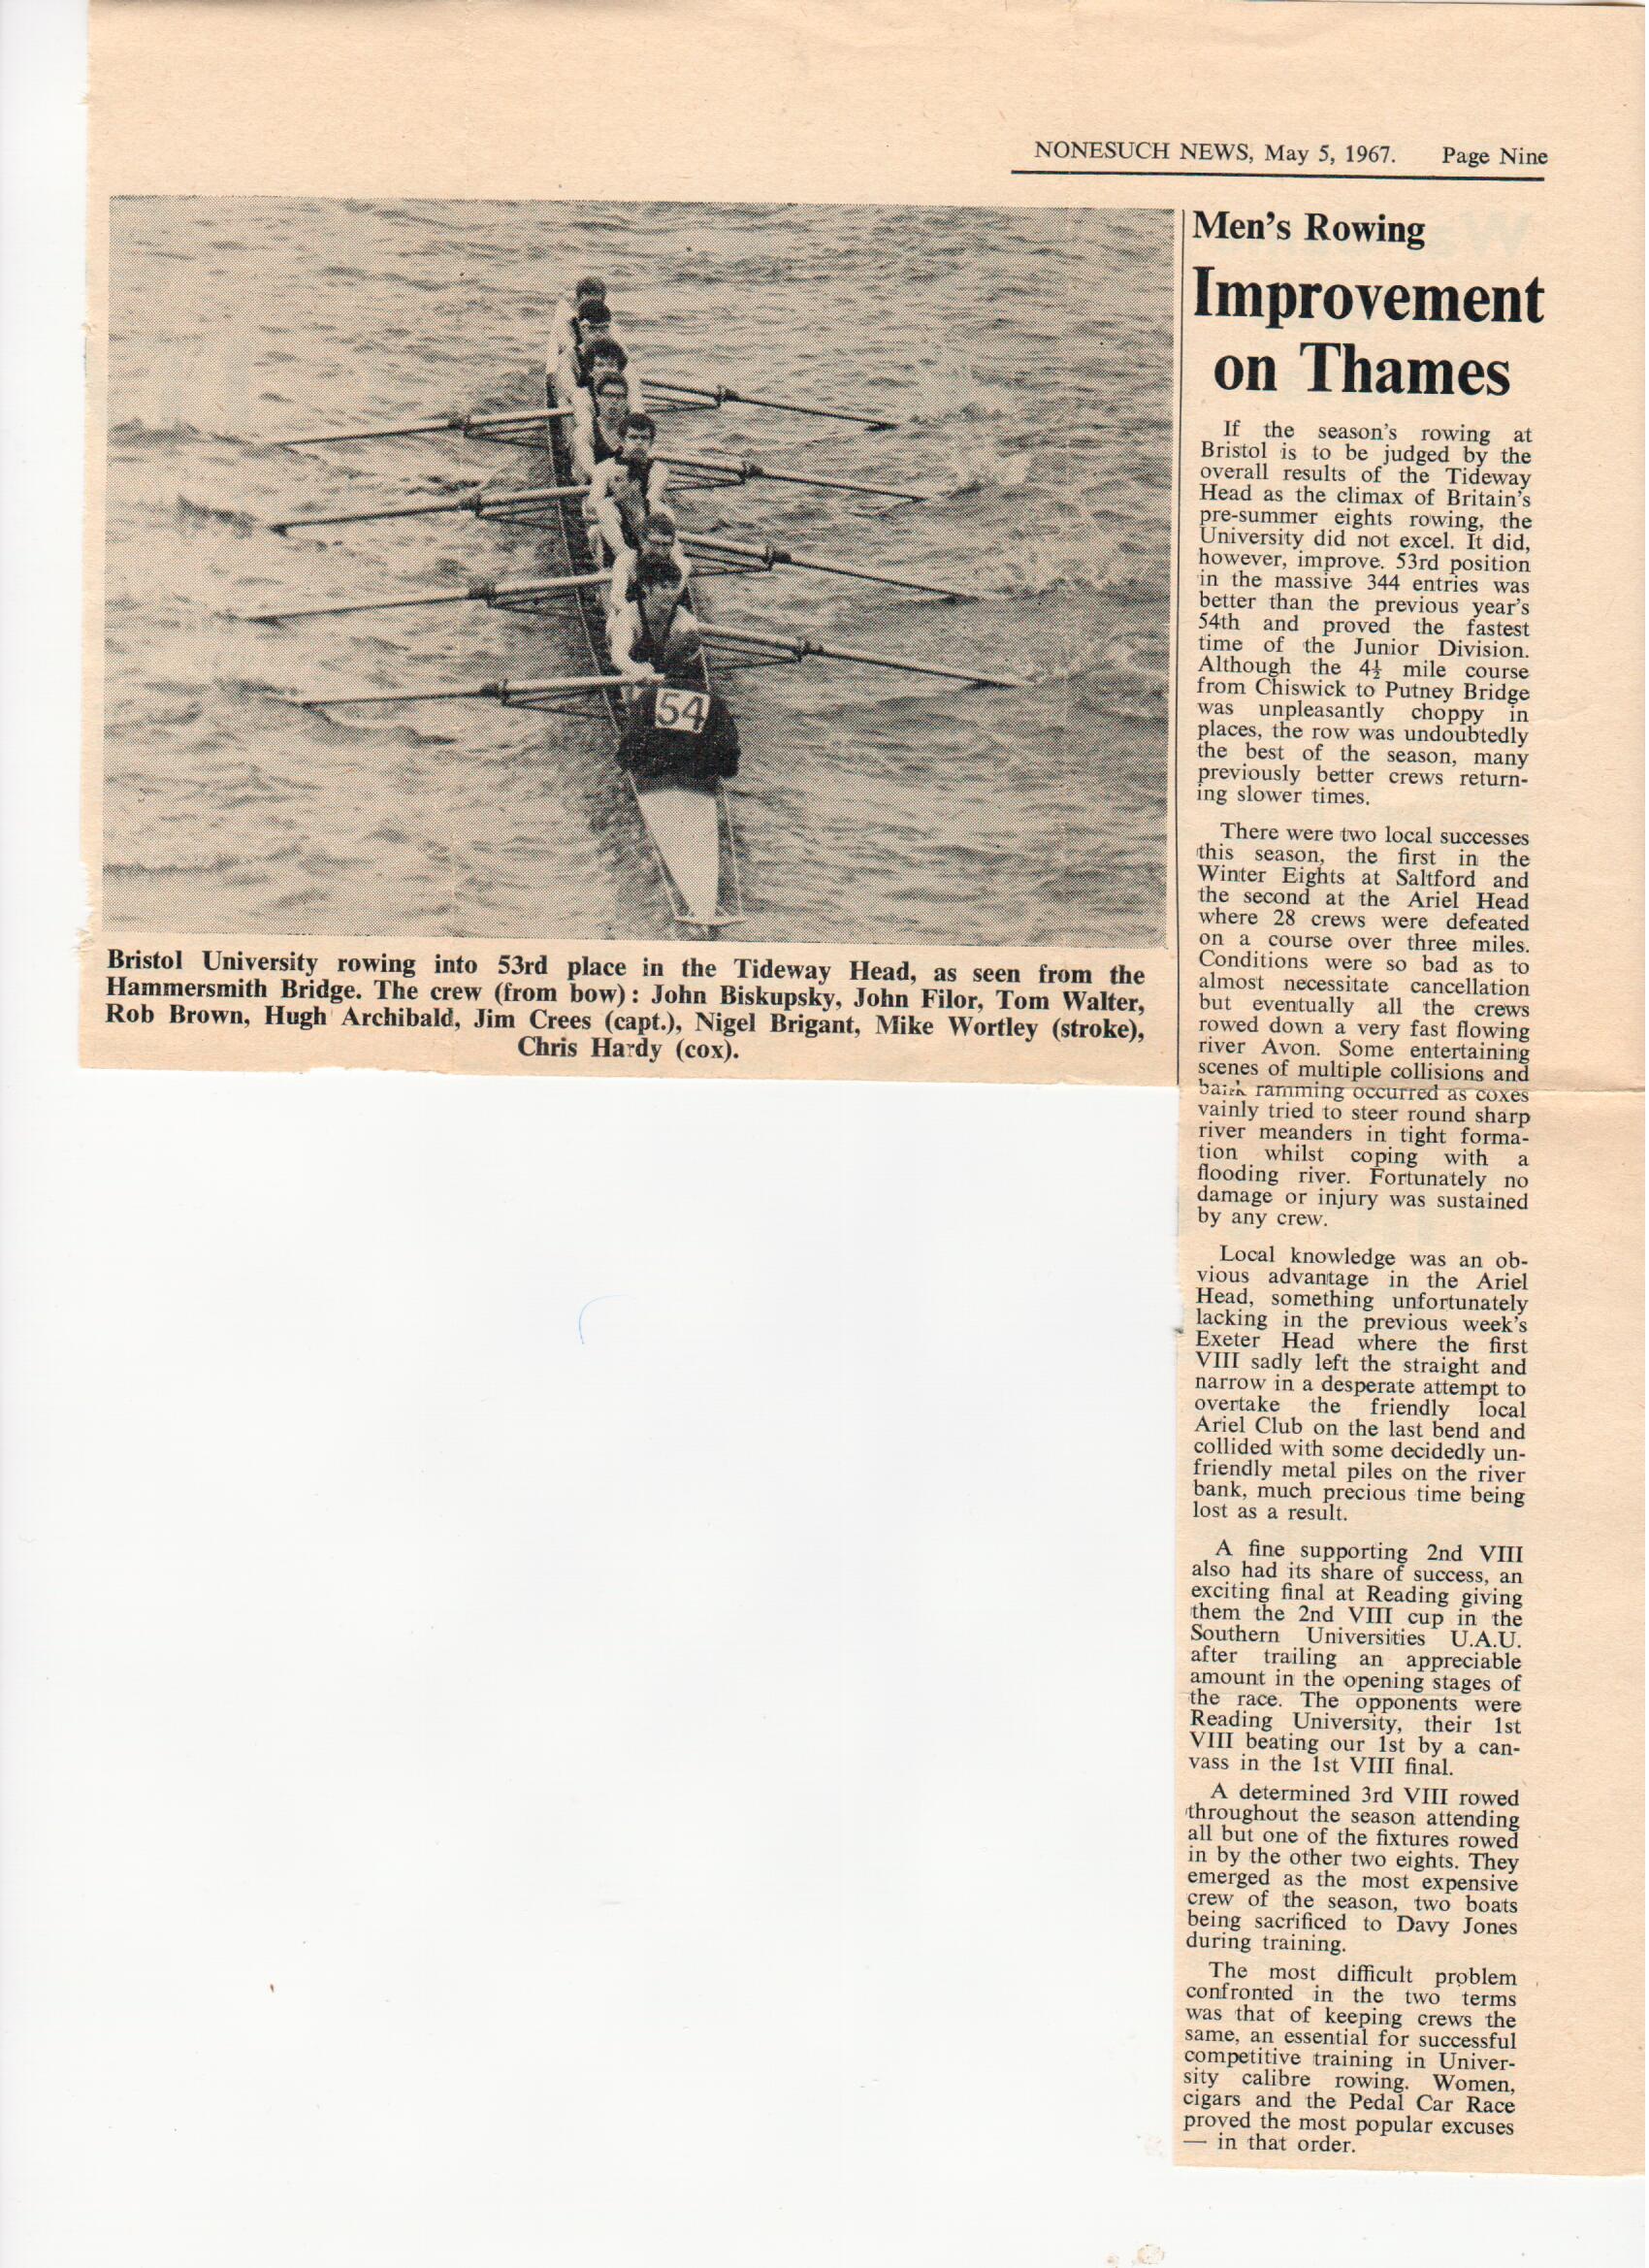 UBBC 1st VIII 1967